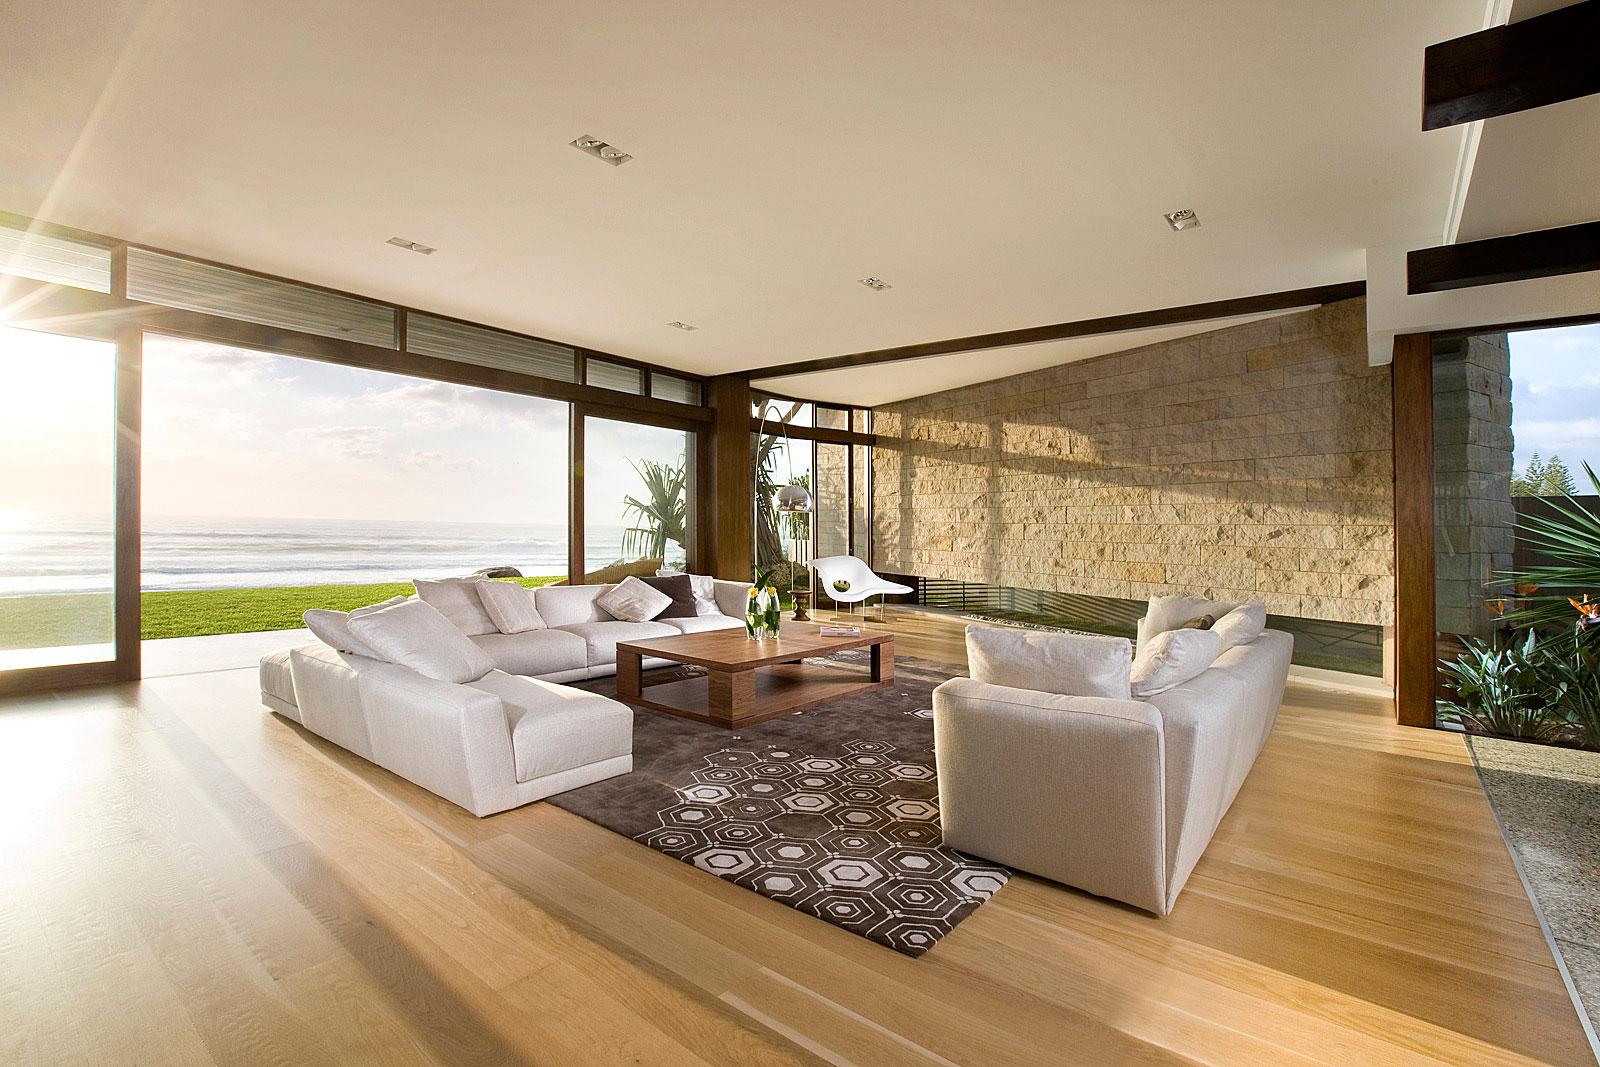 splendid-open-living-room-design-ideas-trend-decoration